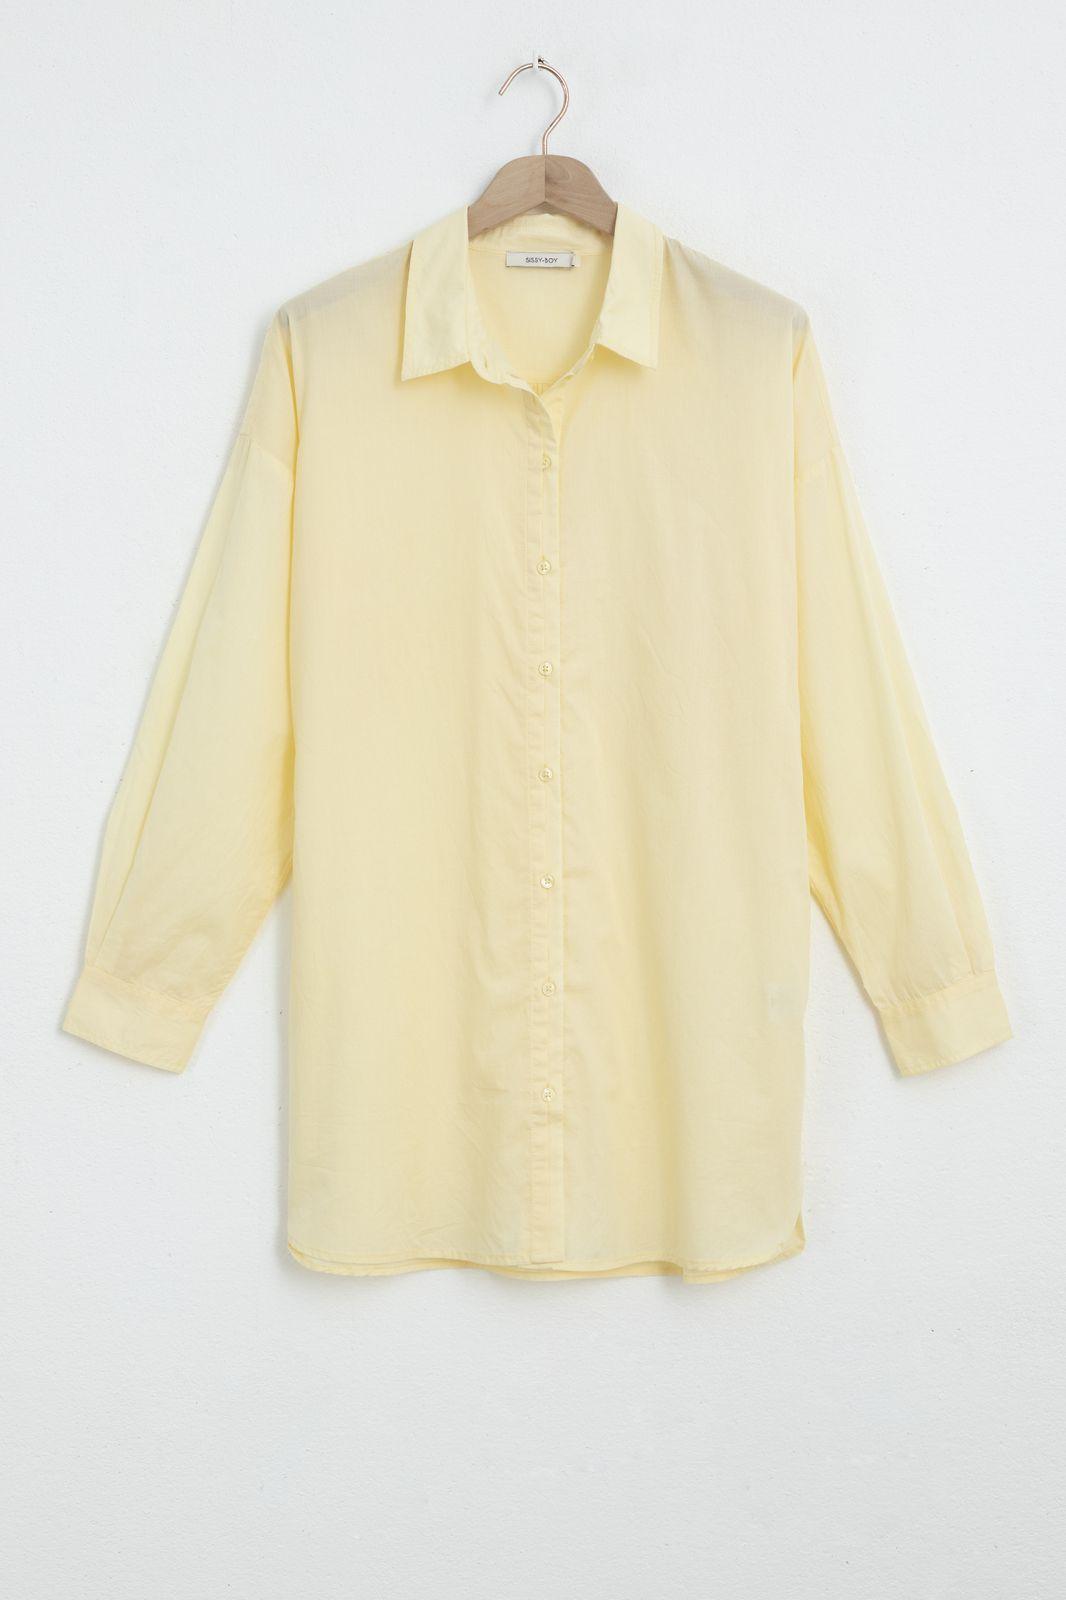 Gele katoenen blouse